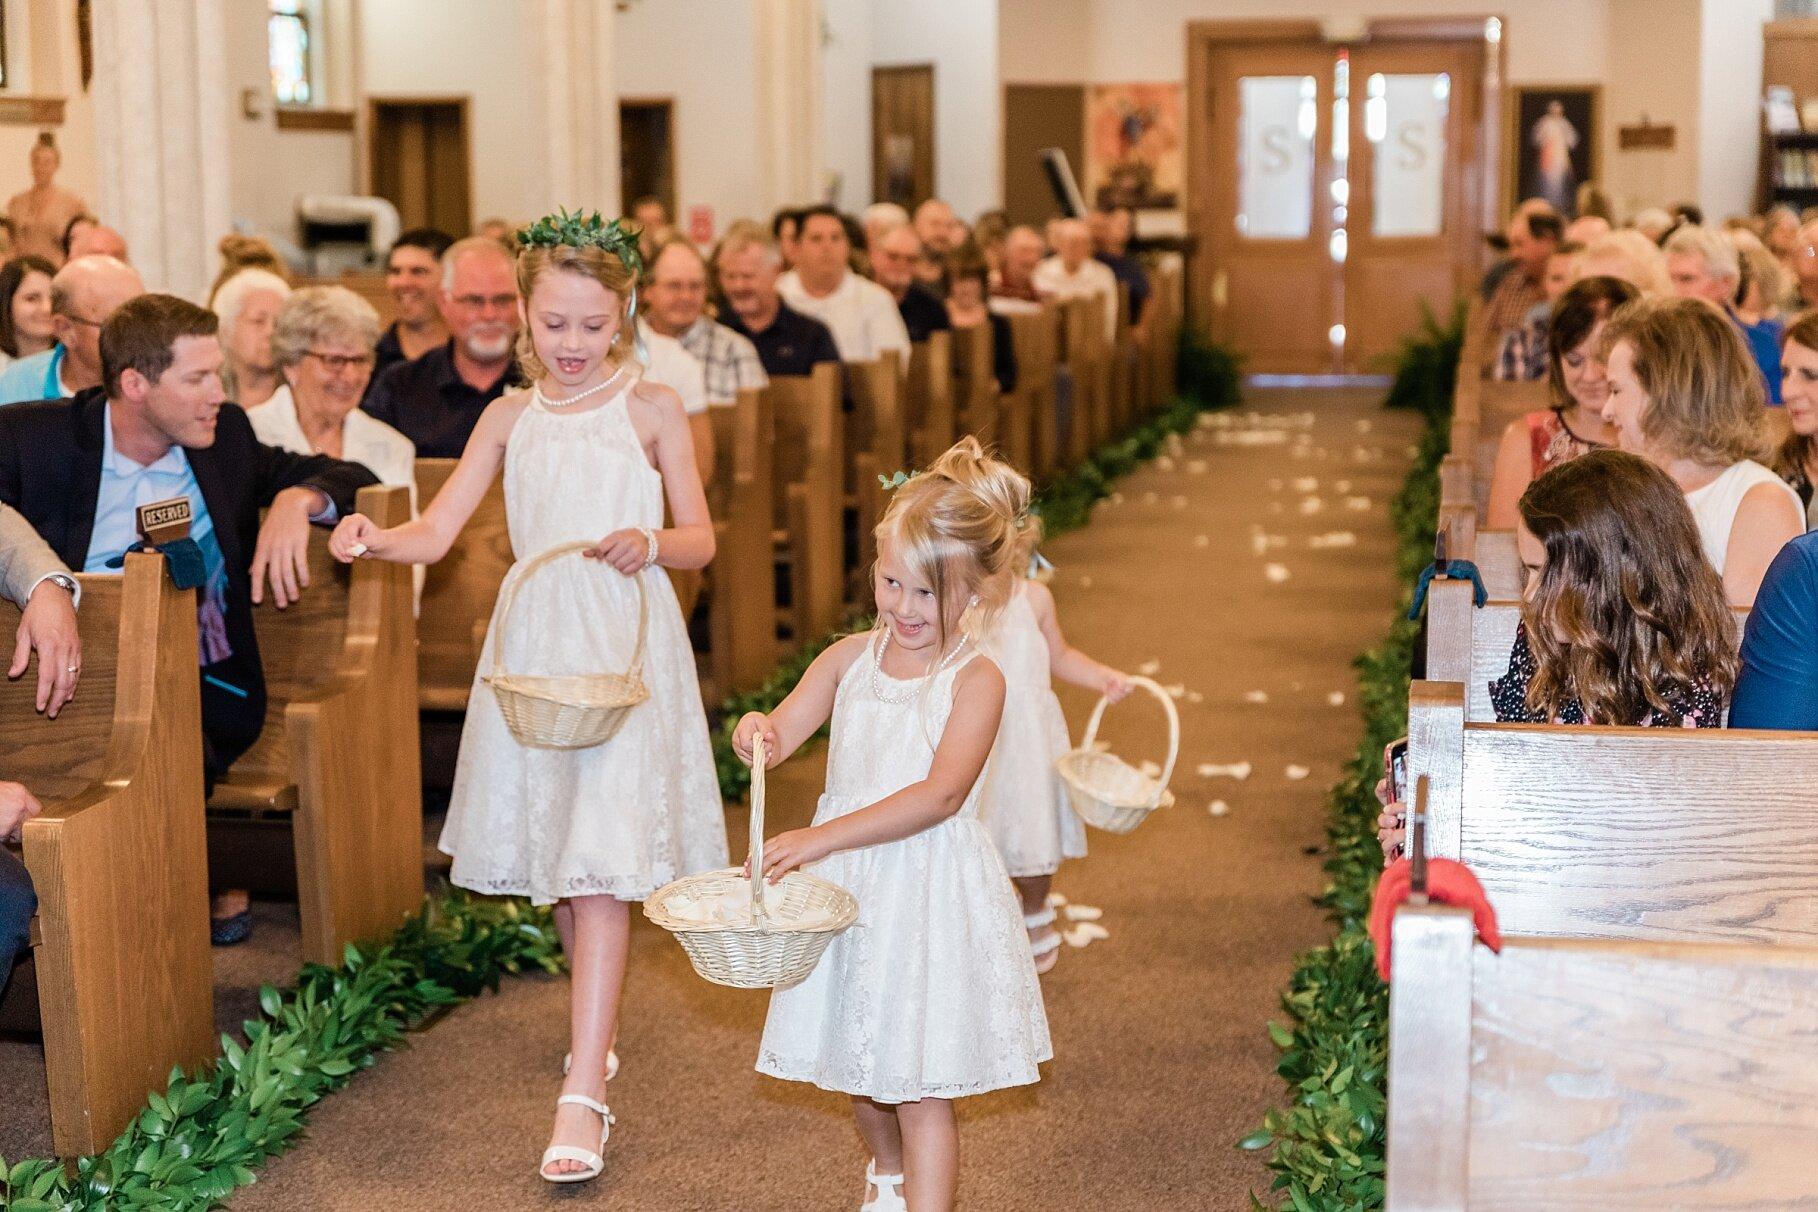 Earth-Toned Wedding by KKP Associate Wedding Photographer and Kelsi Kliethermes Photography Best Columbia Missouri Wedding Photographer_0022.jpg